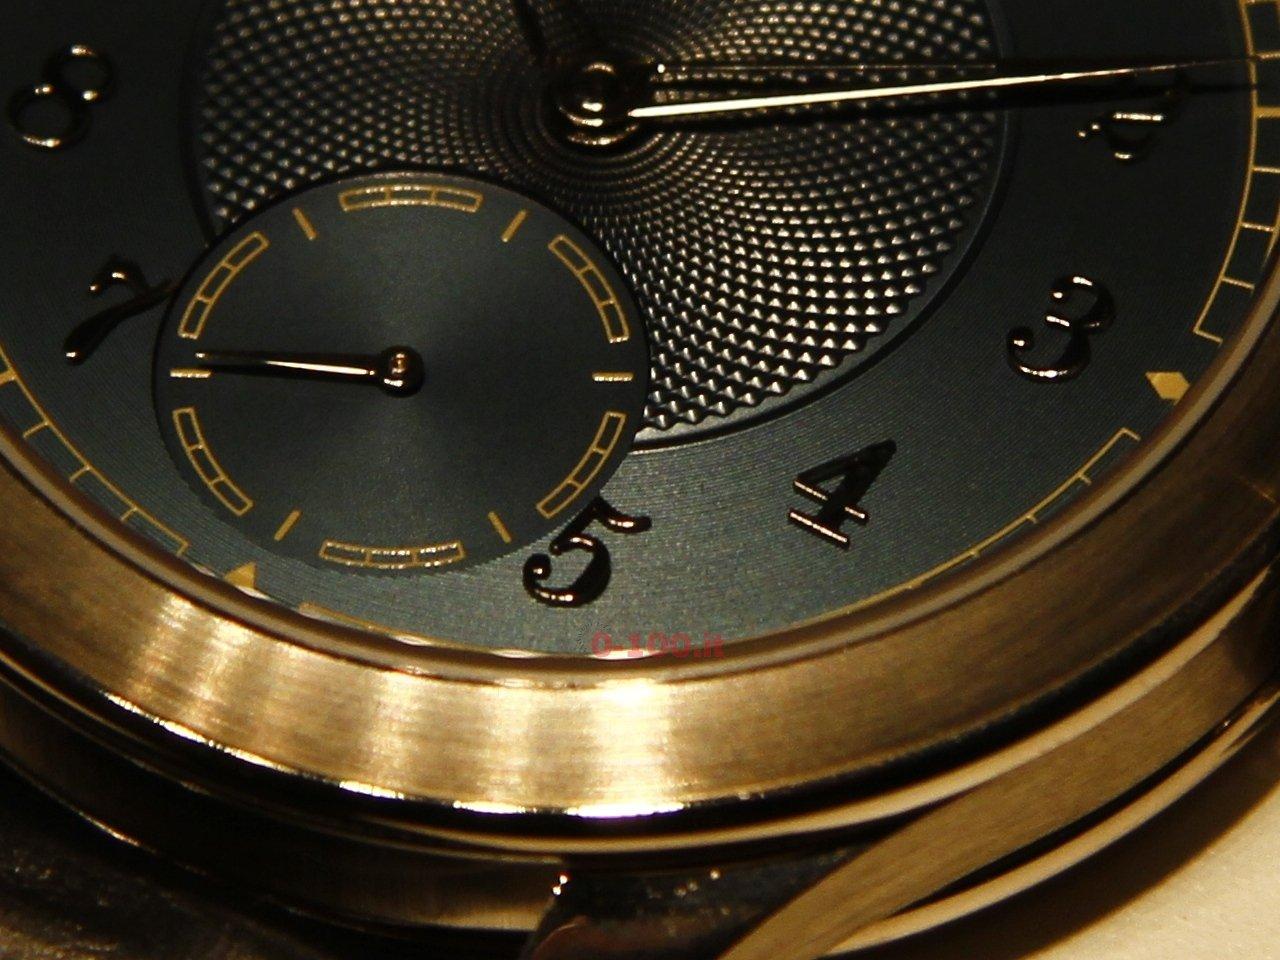 baselworld-2015_leroy-chronometer-l200-0-100-4